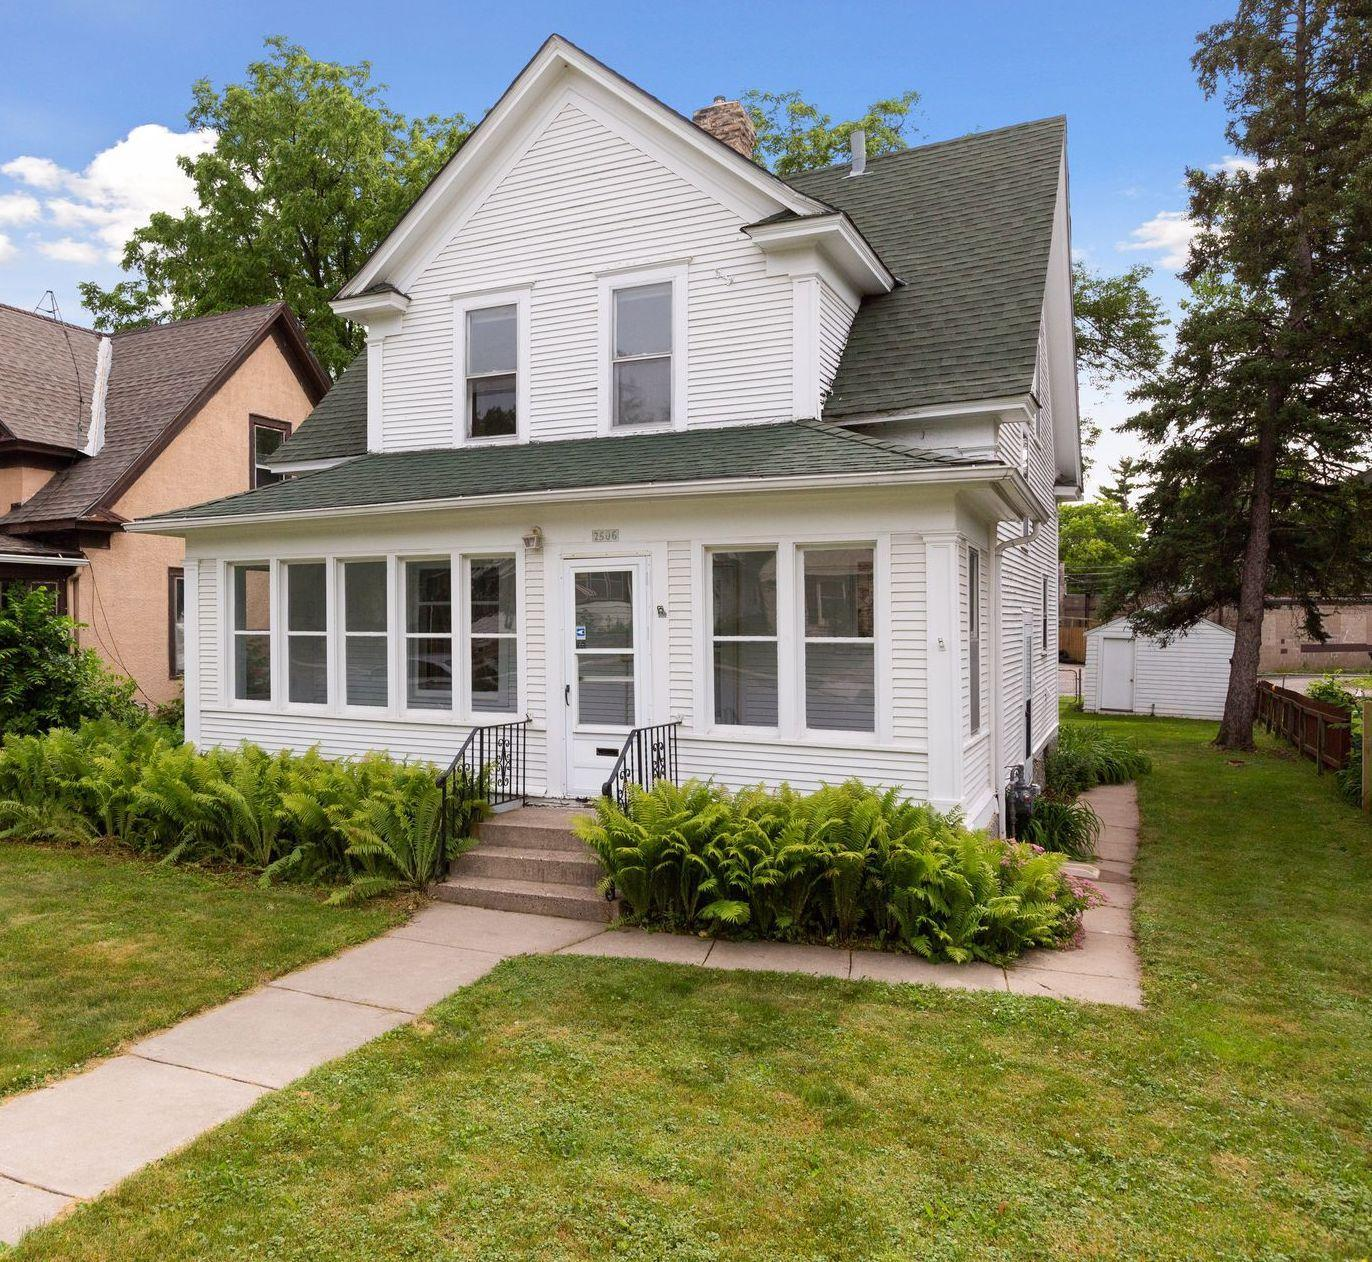 2506 Sheridan N Property Photo - Minneapolis, MN real estate listing